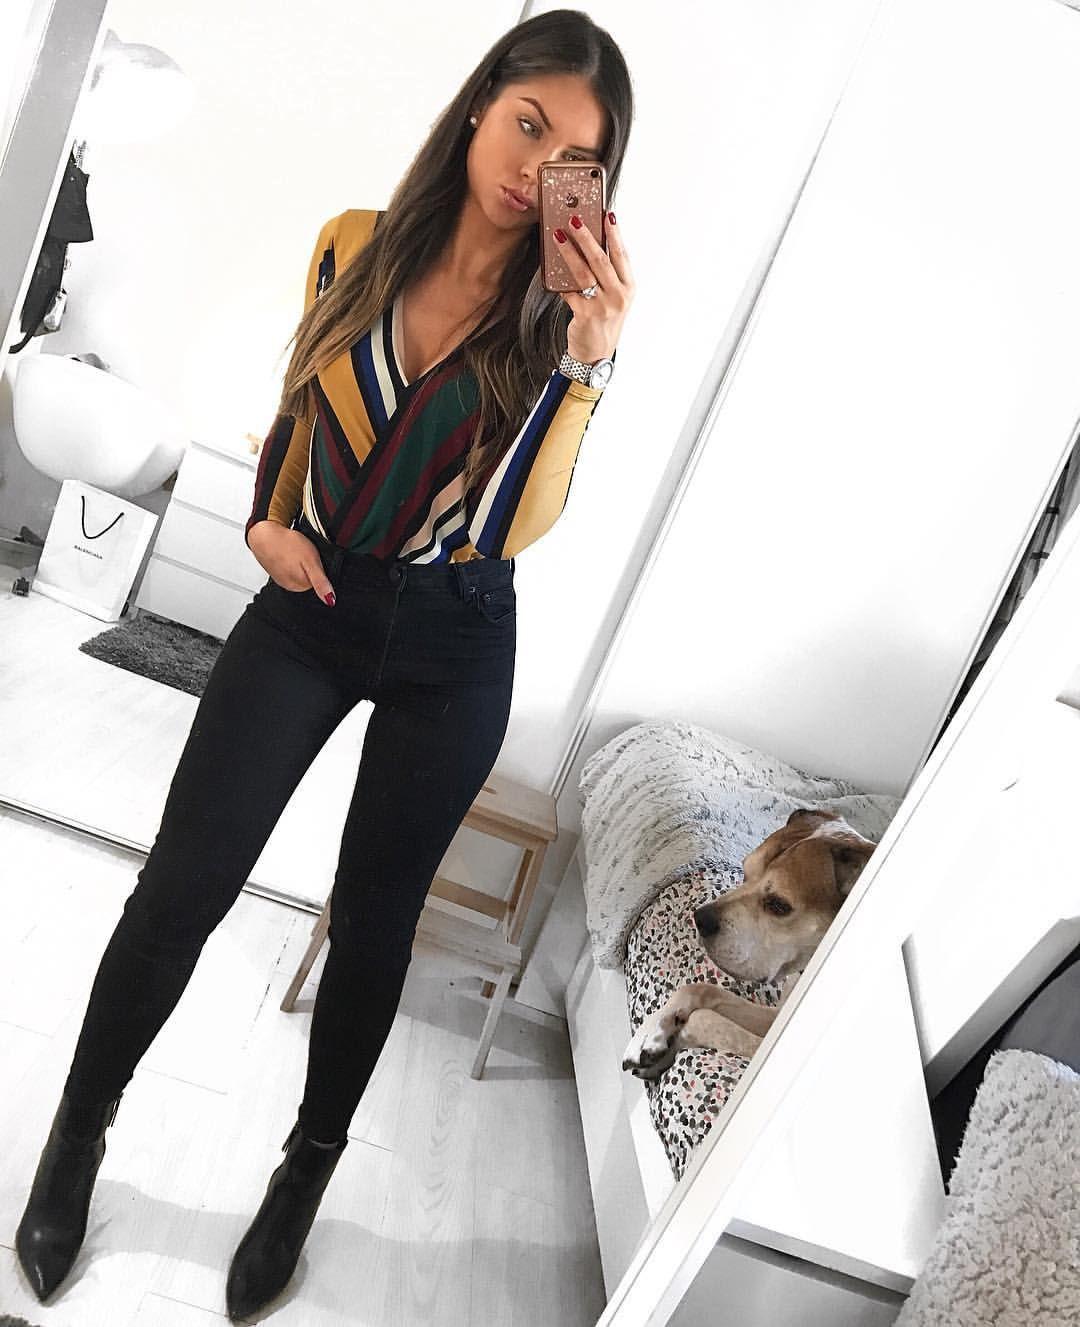 "ee5ec85b6 Salomé on Instagram: ""✓ TOTAL LOOK BERSHKA 🌹 . . Body : REF : 7260/187/305  . Jean : REF : 5006/352/800 . Bottines : REF :…"""